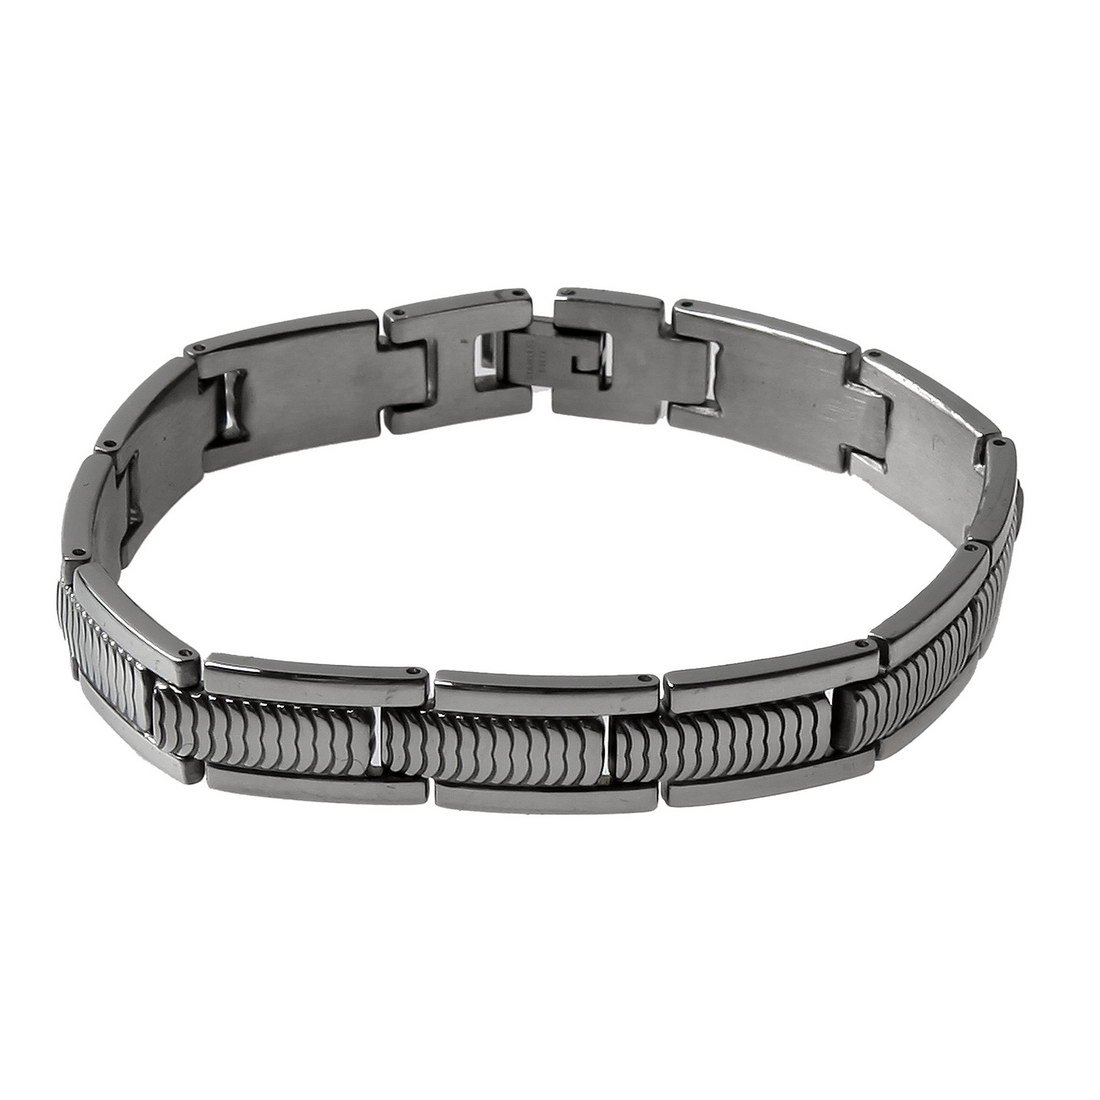 jb1003 Rolex Cobra Bisagra de acero inoxidable pulsera para ...